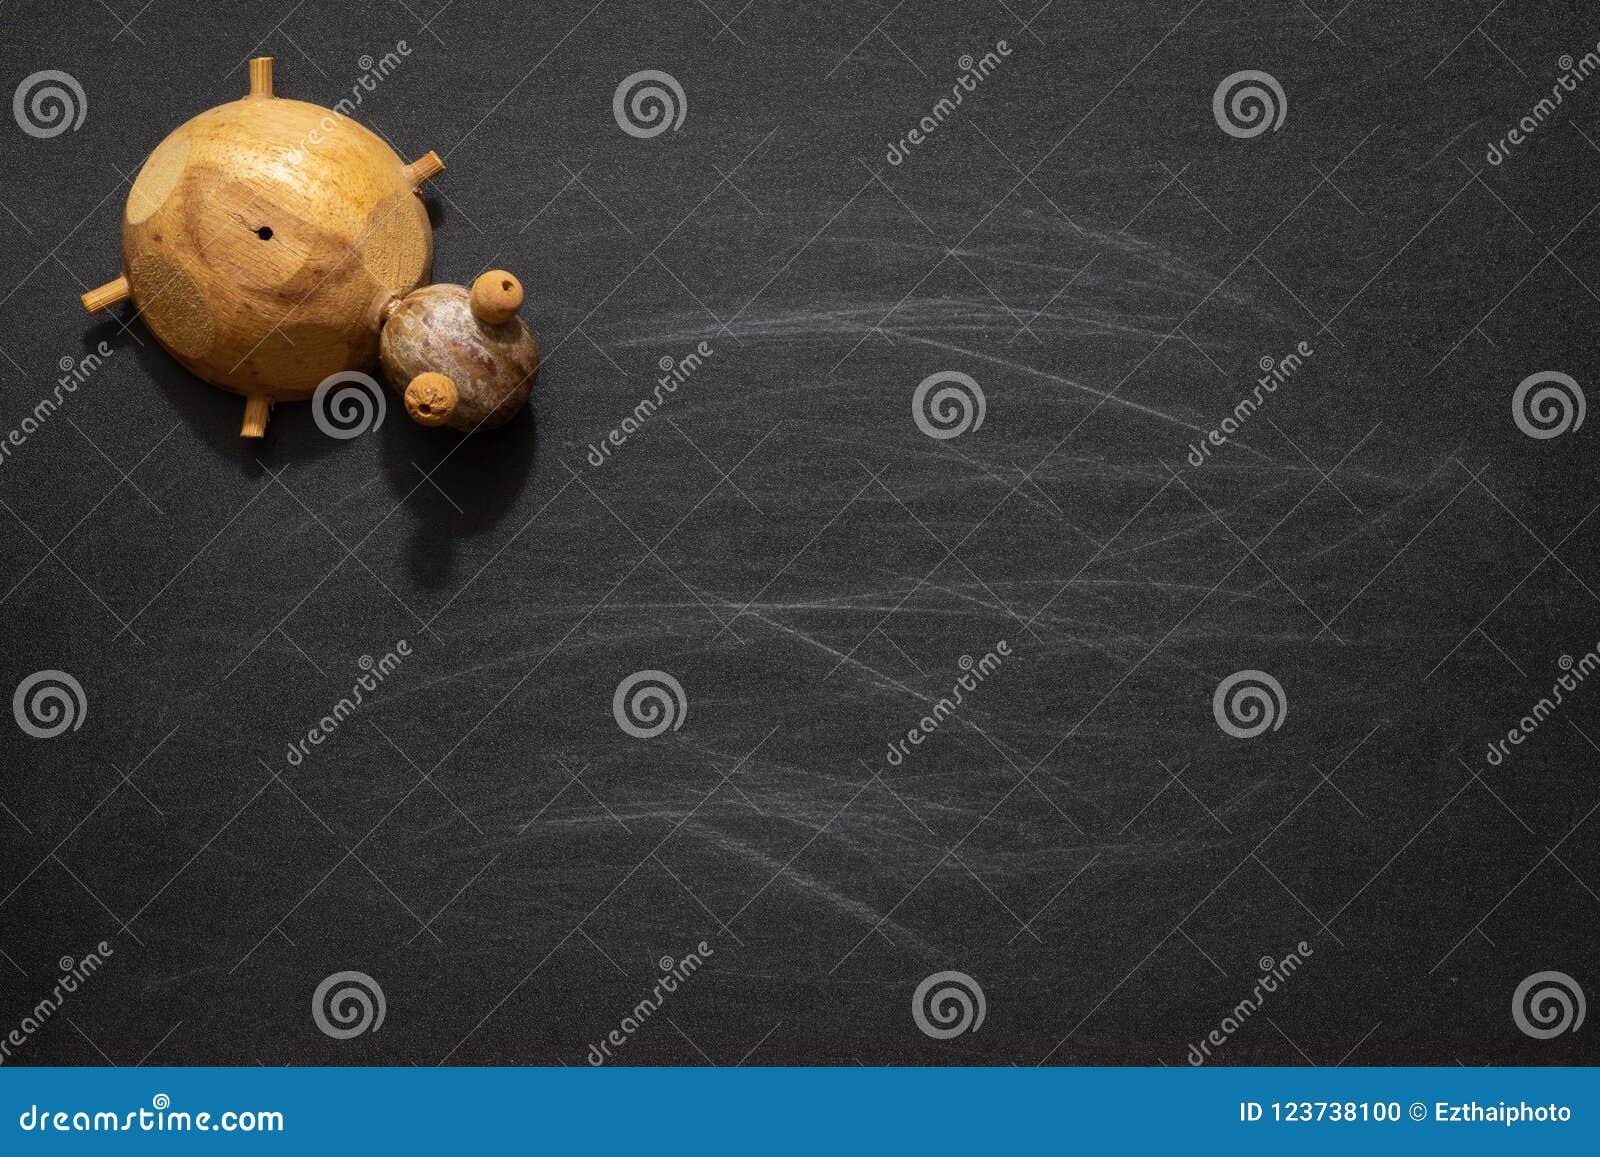 cute turtle toys on black chalkboard with blank copy space idea